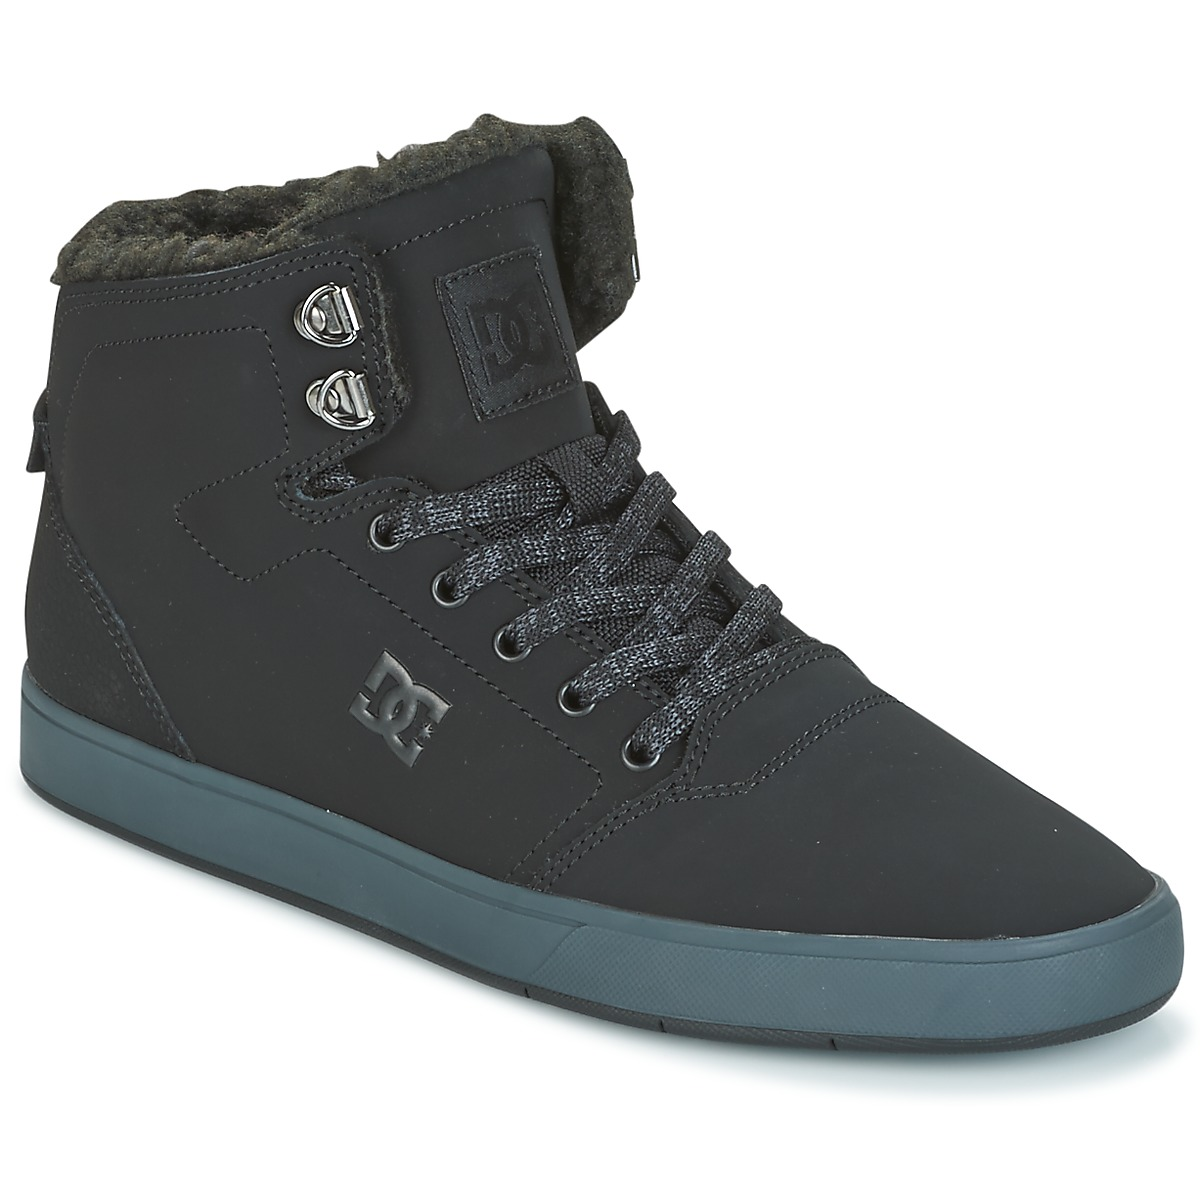 DC Shoes CRISIS HIGH WNT Schwarz / Grau - Kostenloser Versand bei Spartoode ! - Schuhe Sneaker High Herren 73,50 €